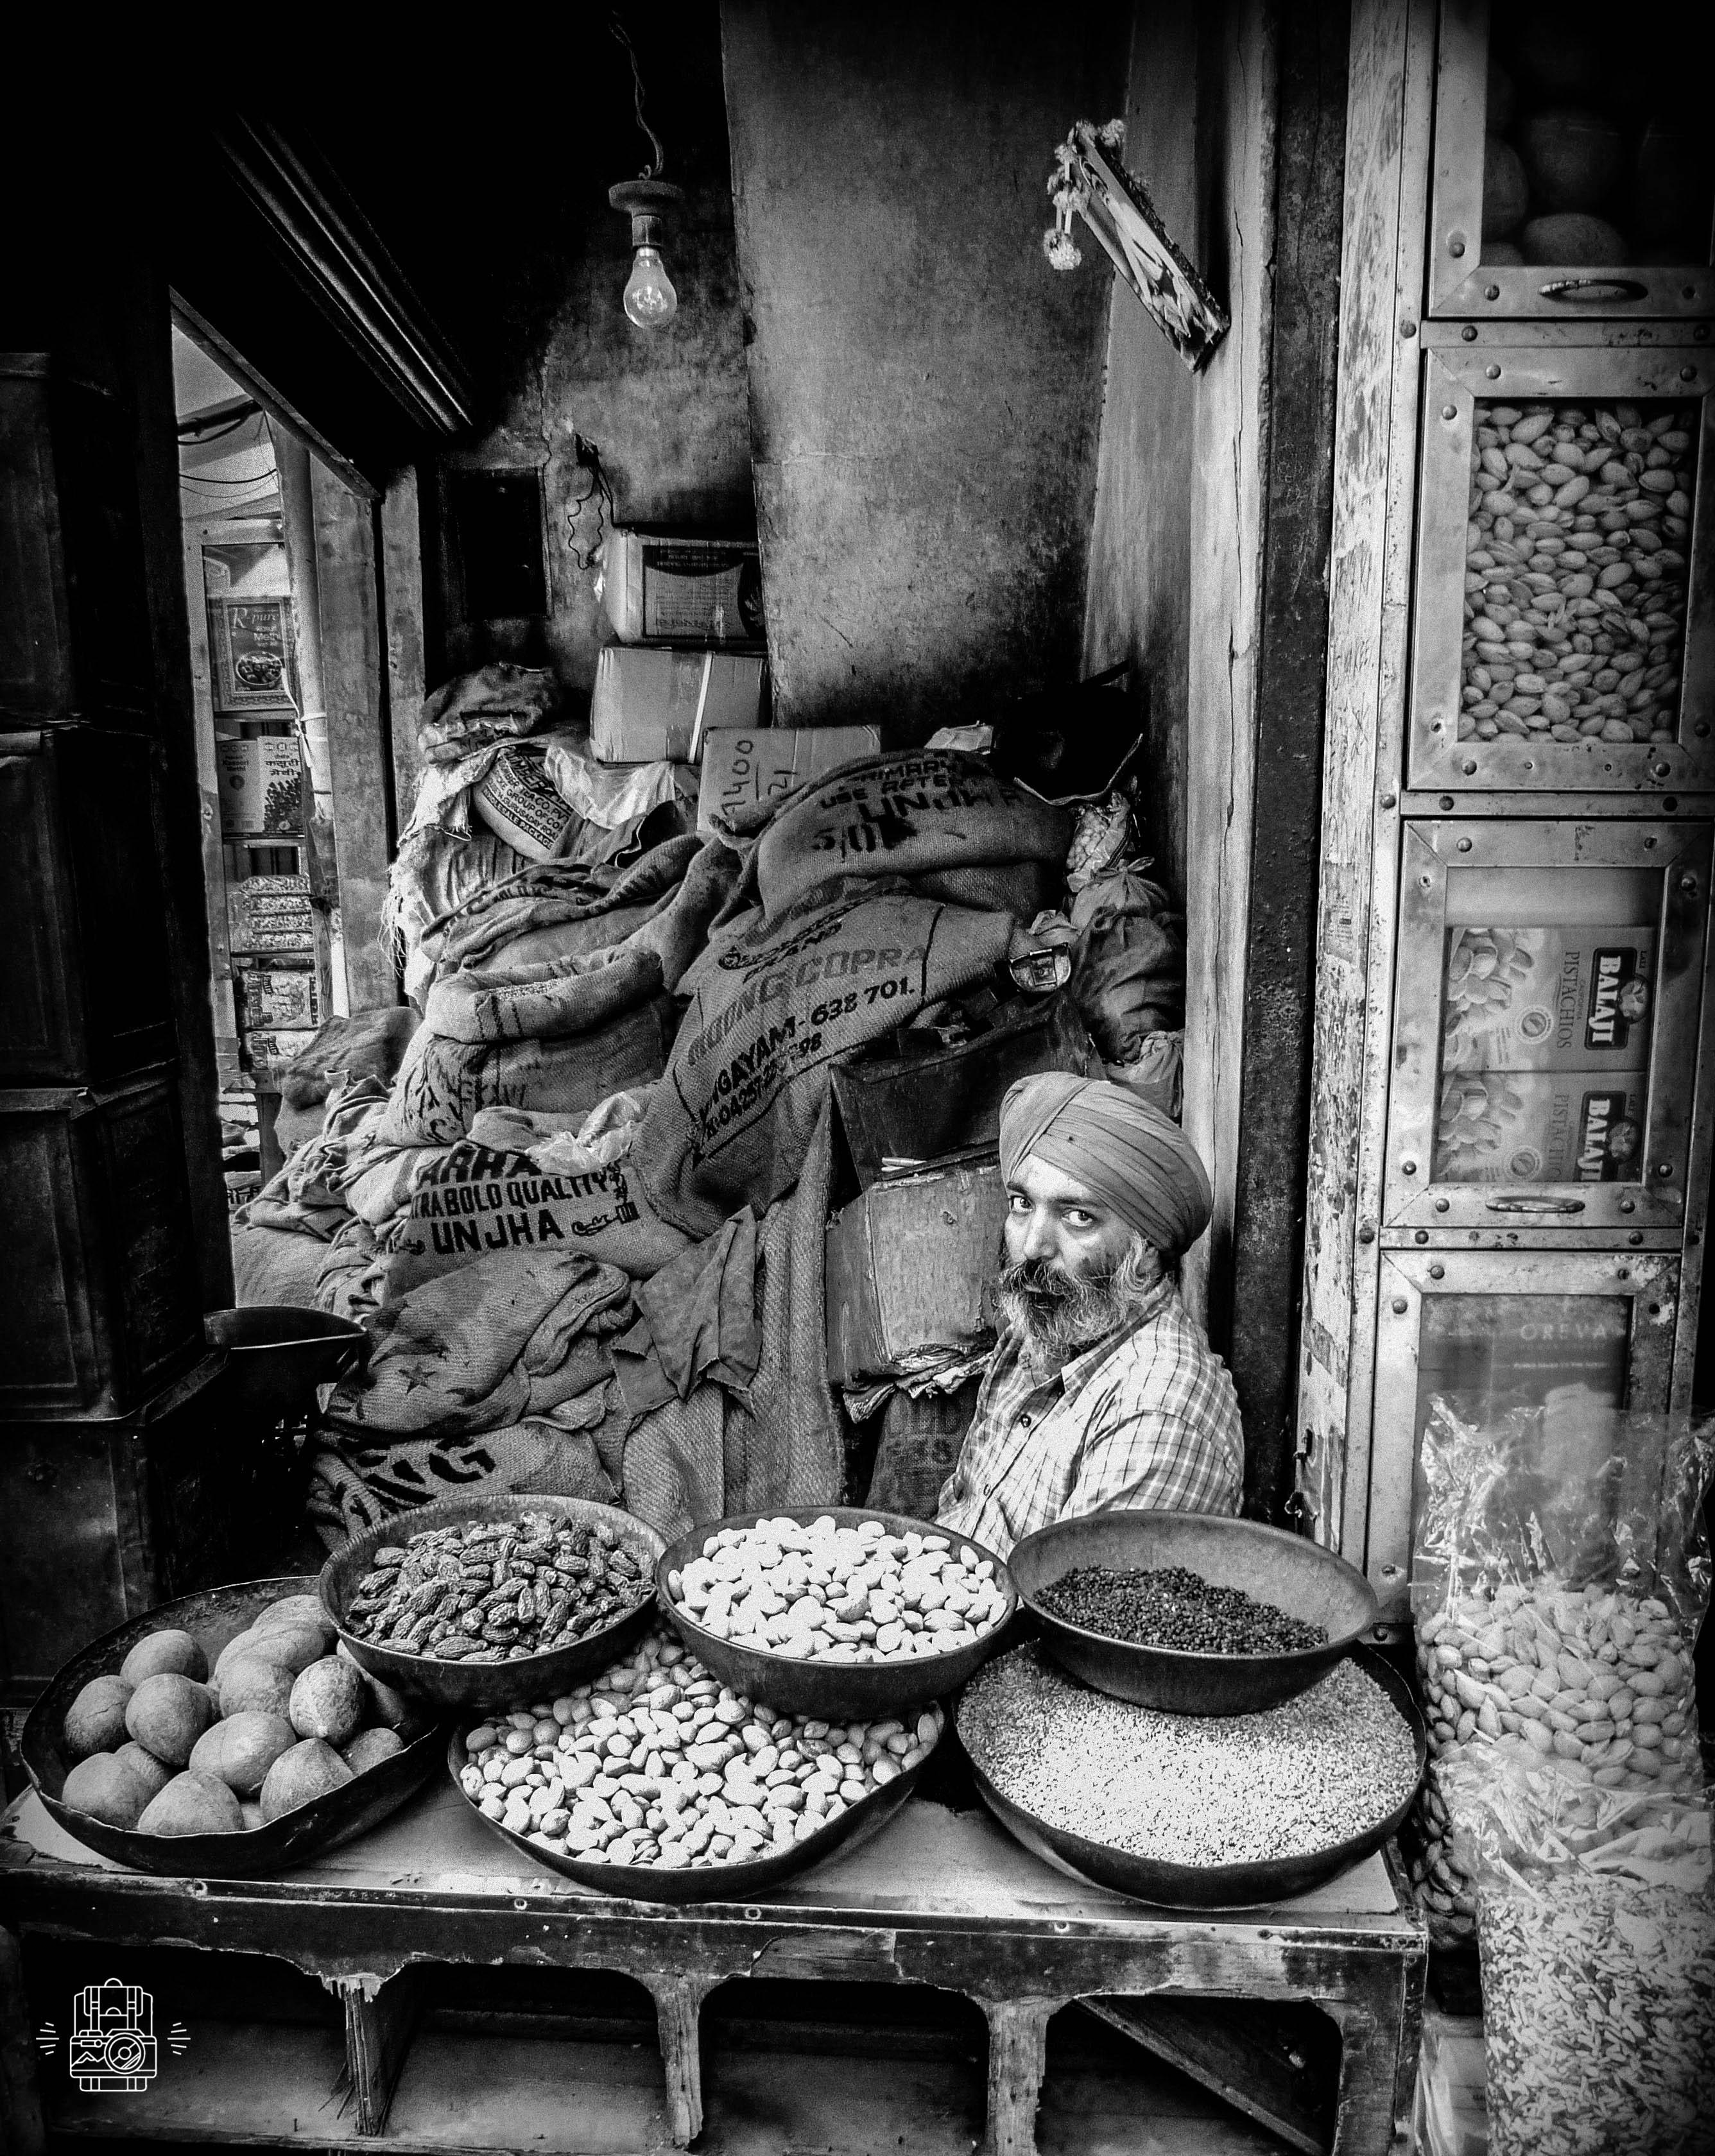 Inde/Amristar